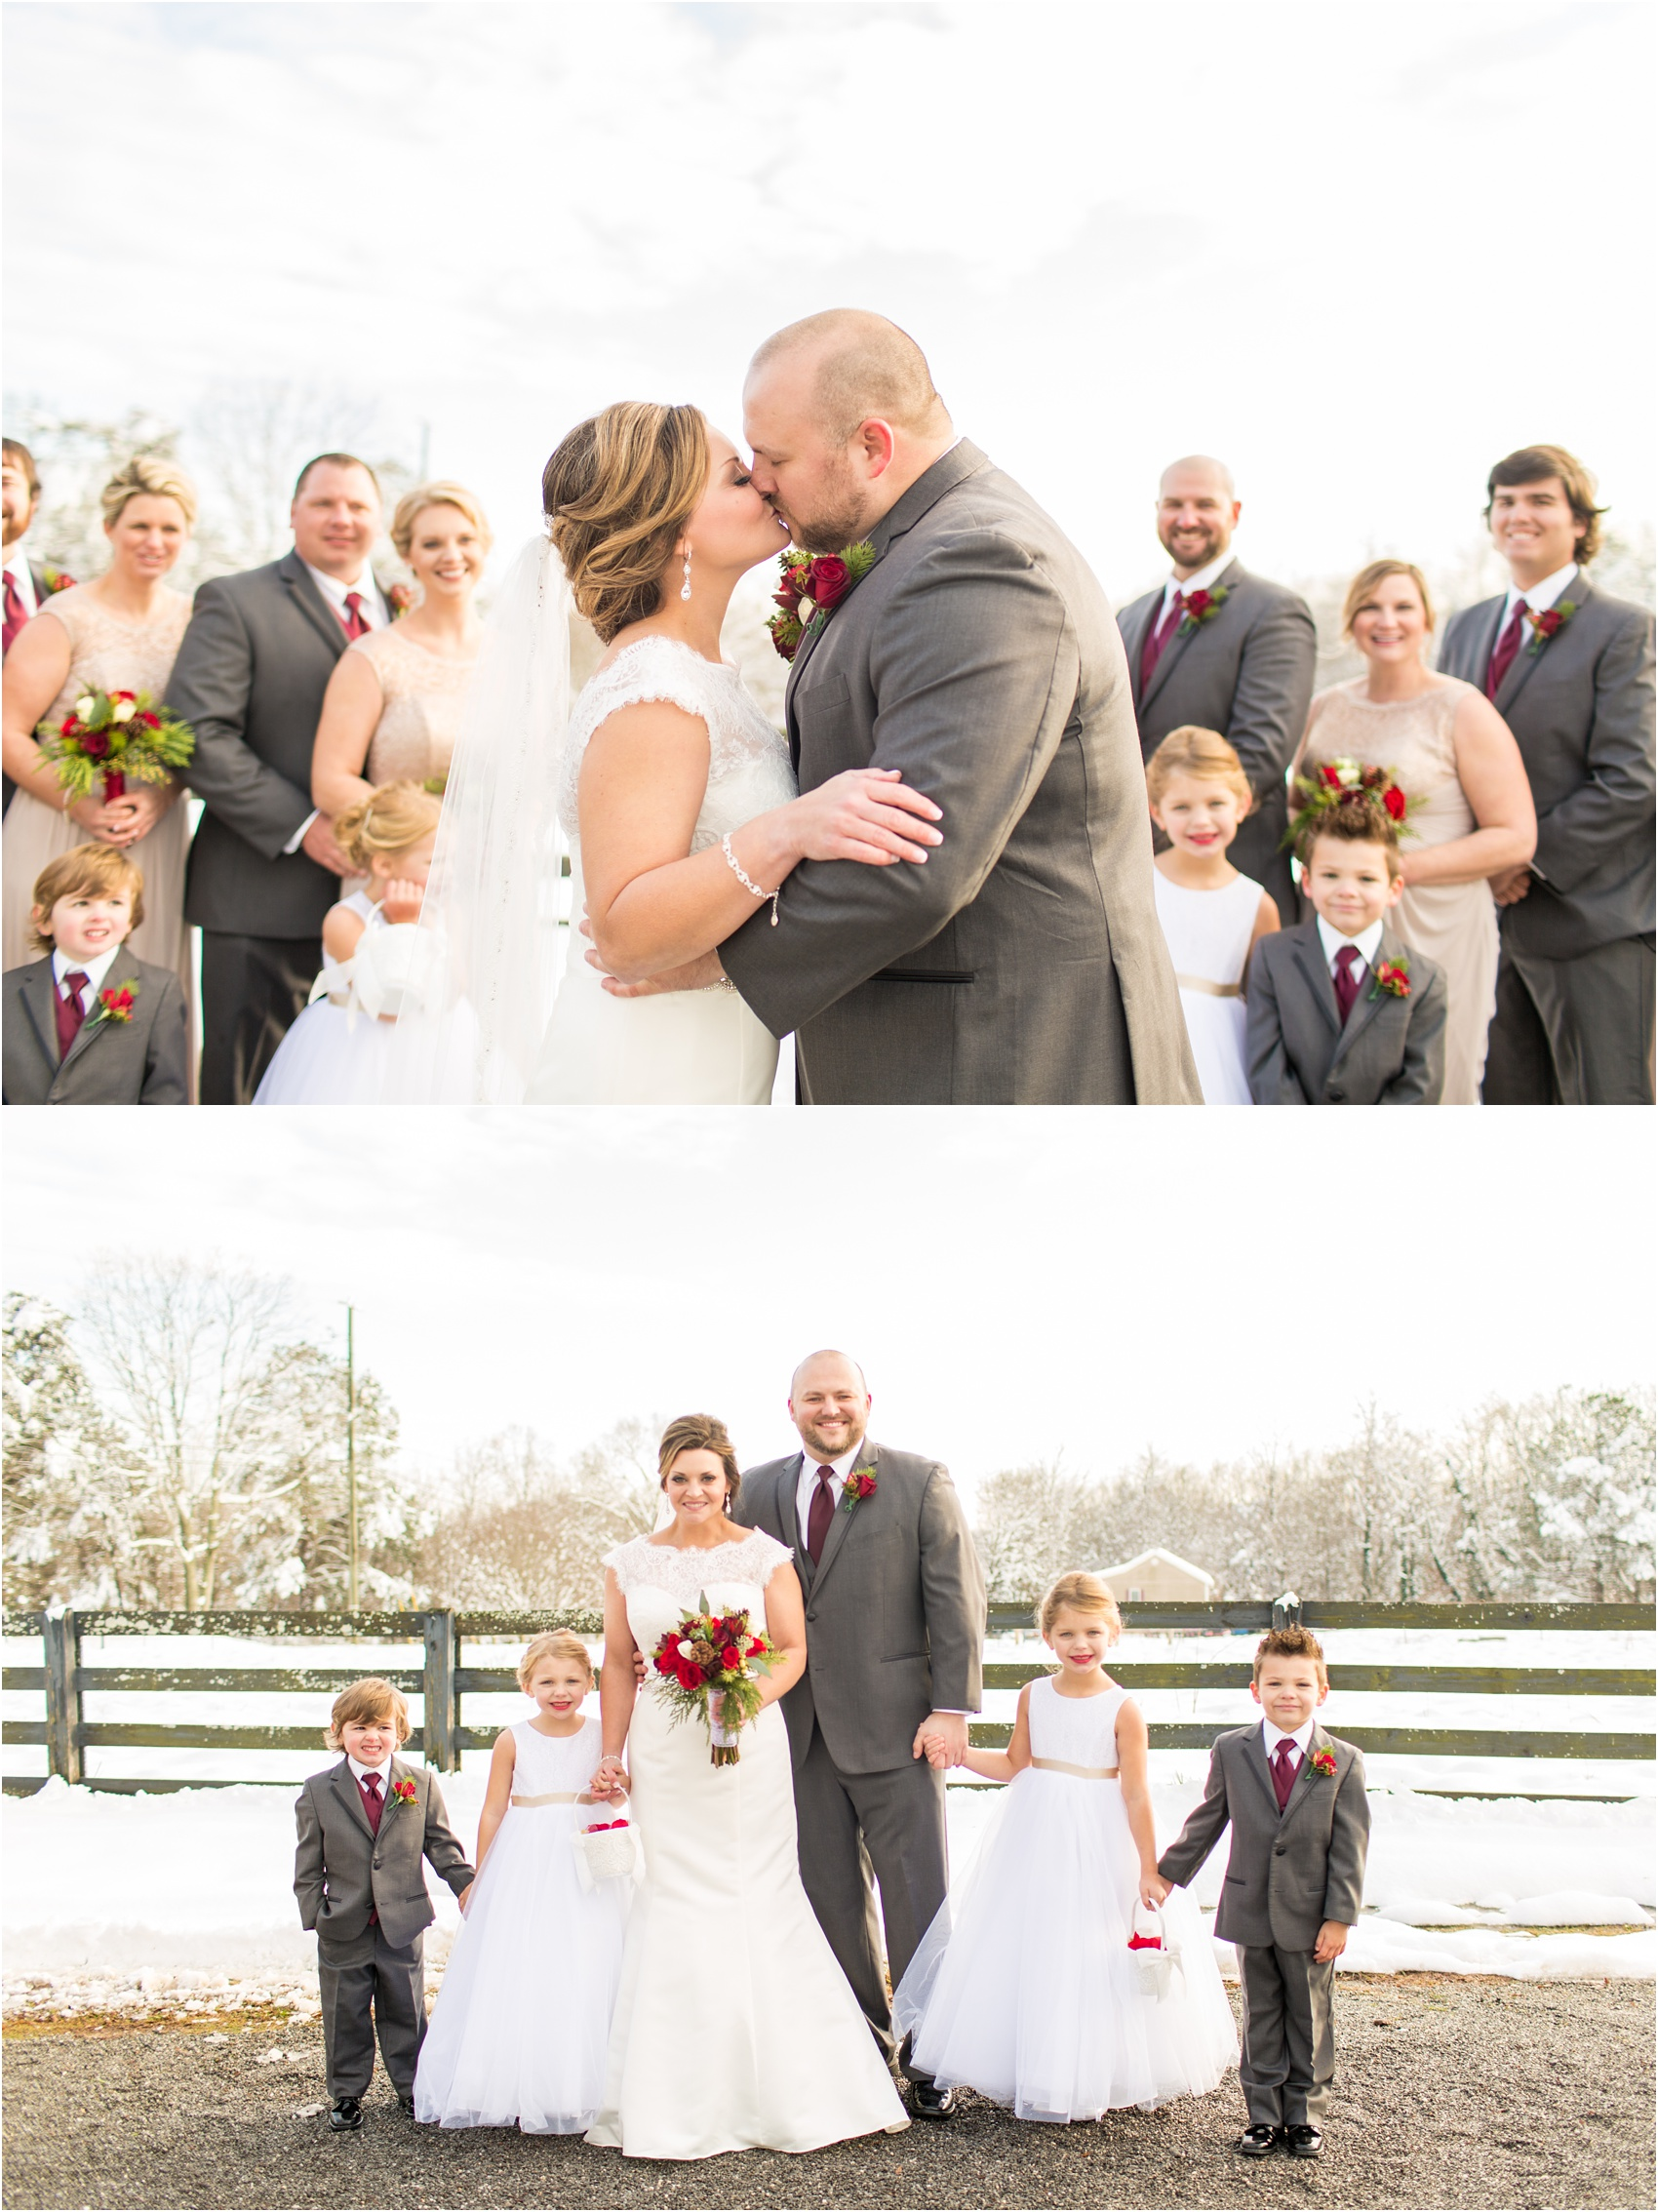 Savannah Eve Photography- Page Wedding Blog-60.jpg